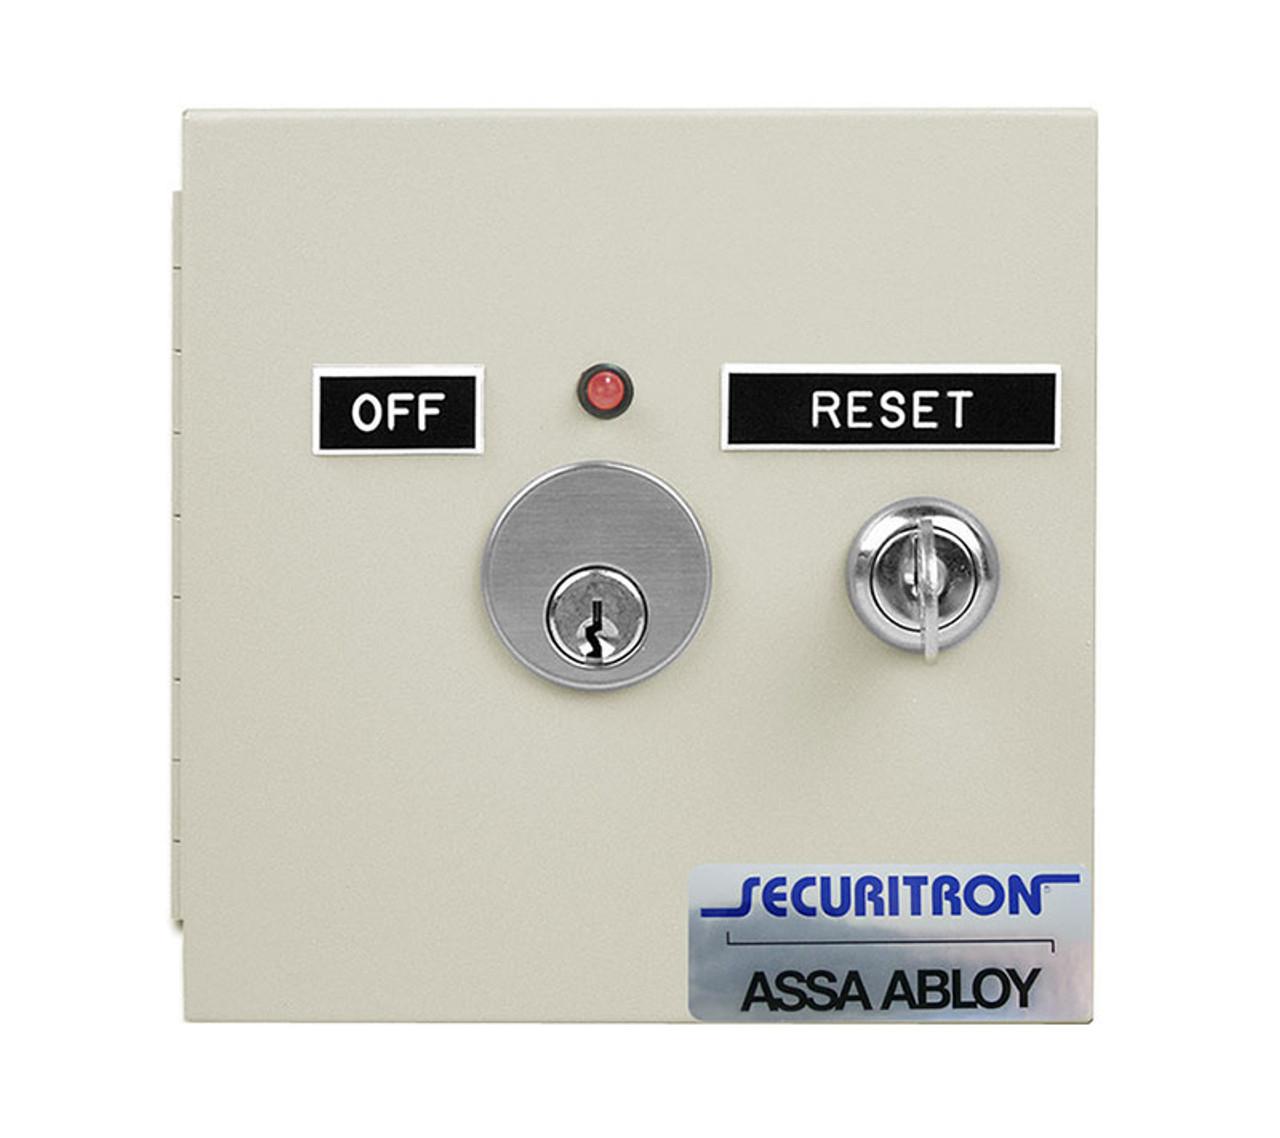 Securitron Far 12 12vdc Fire Alarm Reset